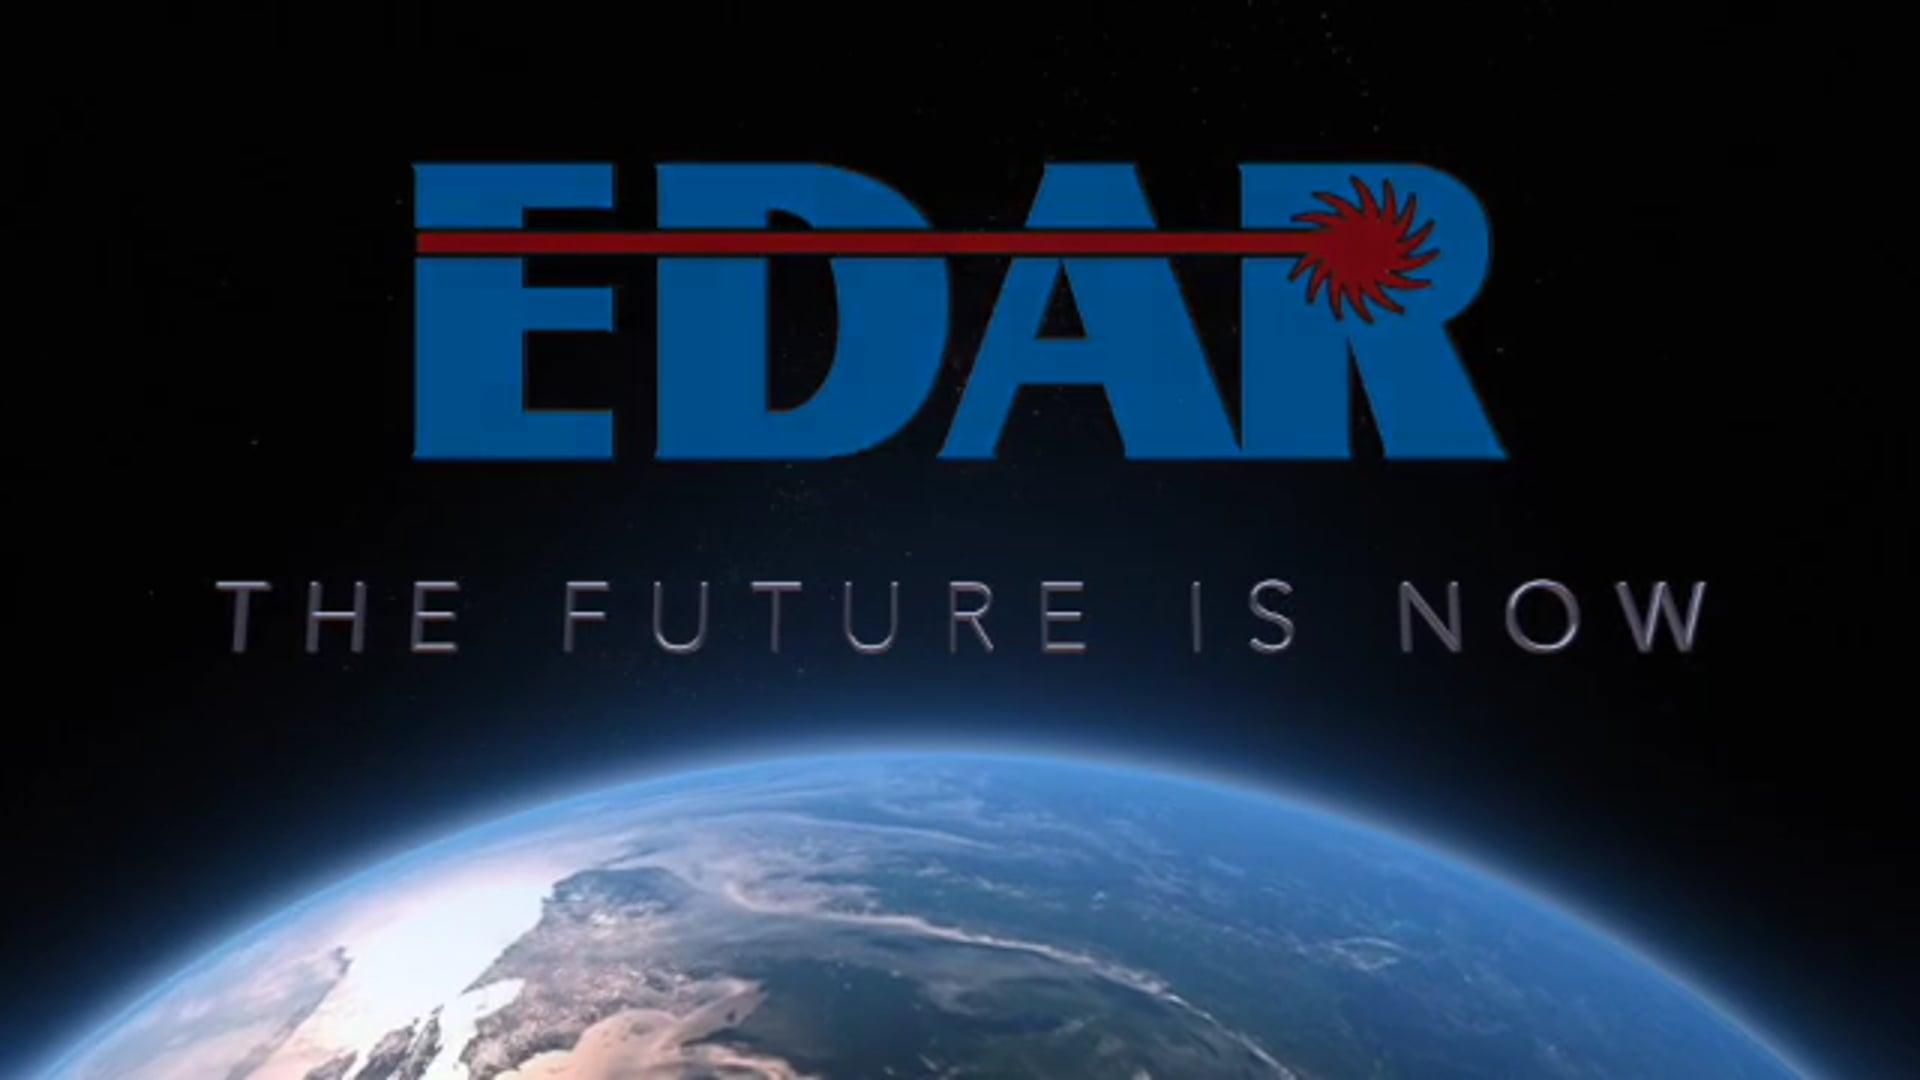 HEAT & EDAR Fact Video